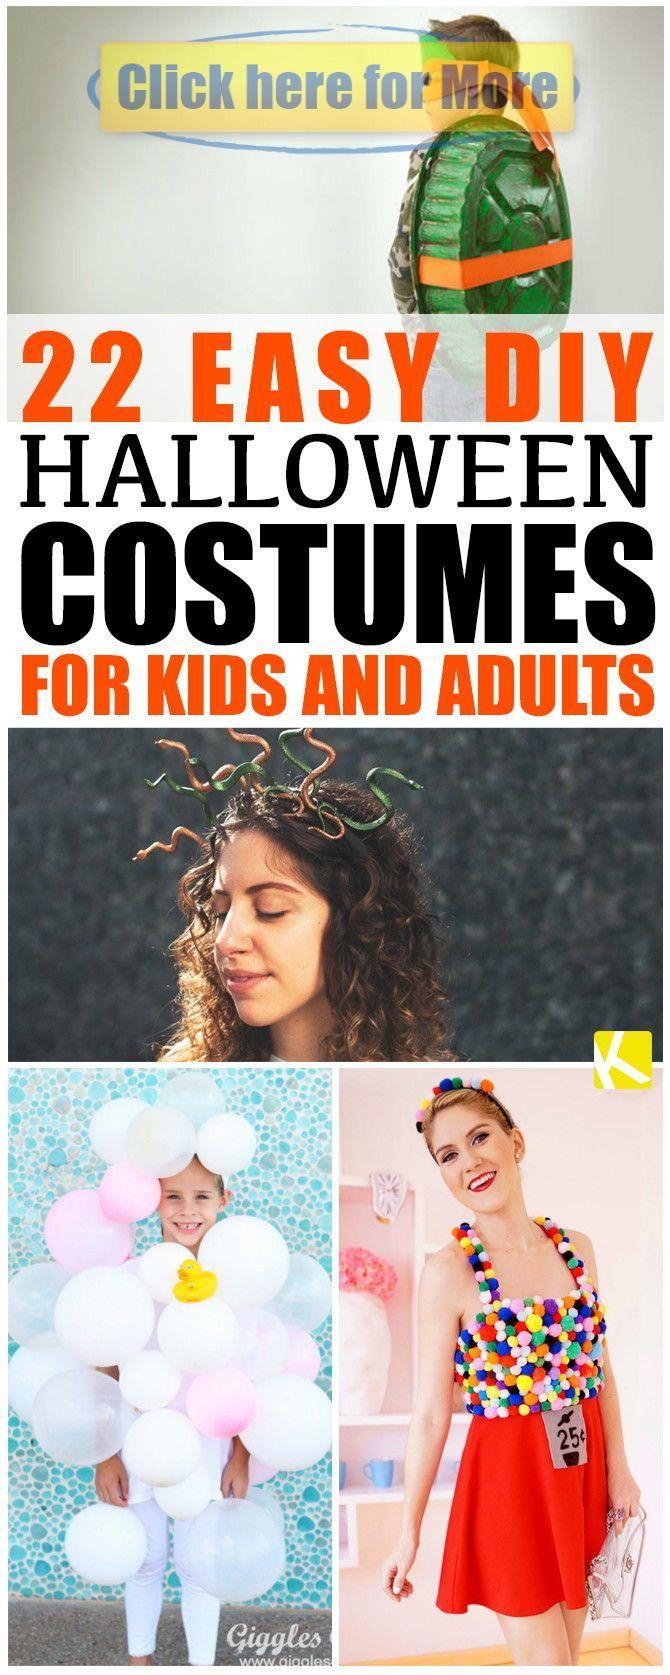 22 Easy DIY Halloween Costumes for Kids and Adults   - Halloween #déguisementsdhalloweenfaitsmain